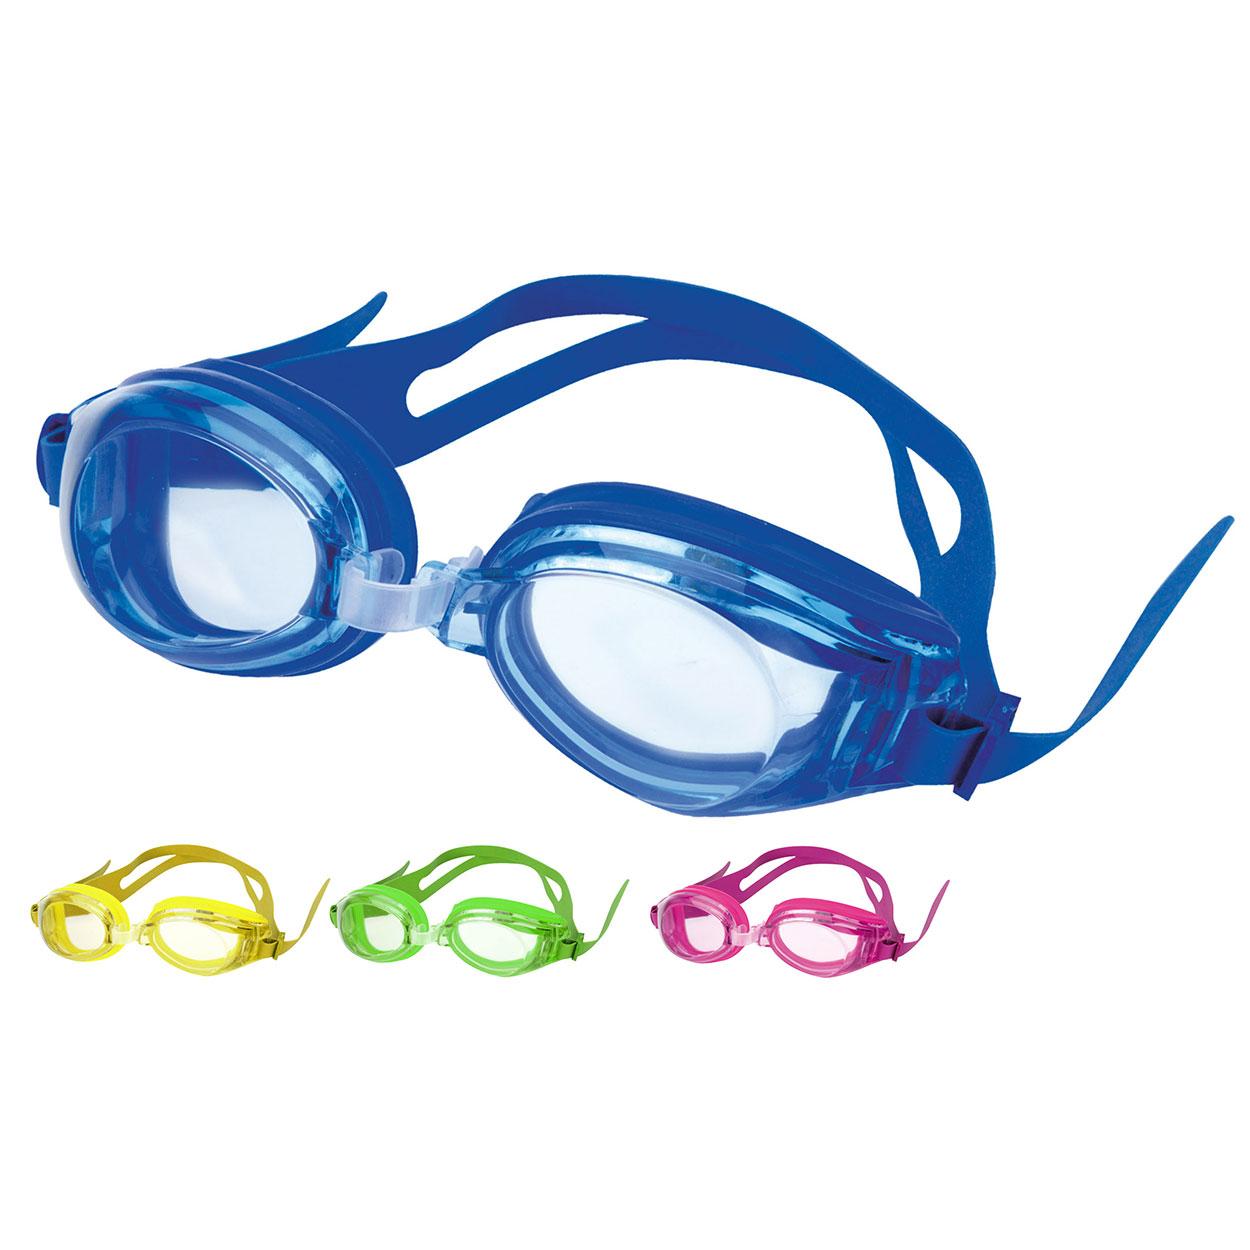 61677117e20ce1 Kinder Duikbril online kopen | Lobbes Speelgoed